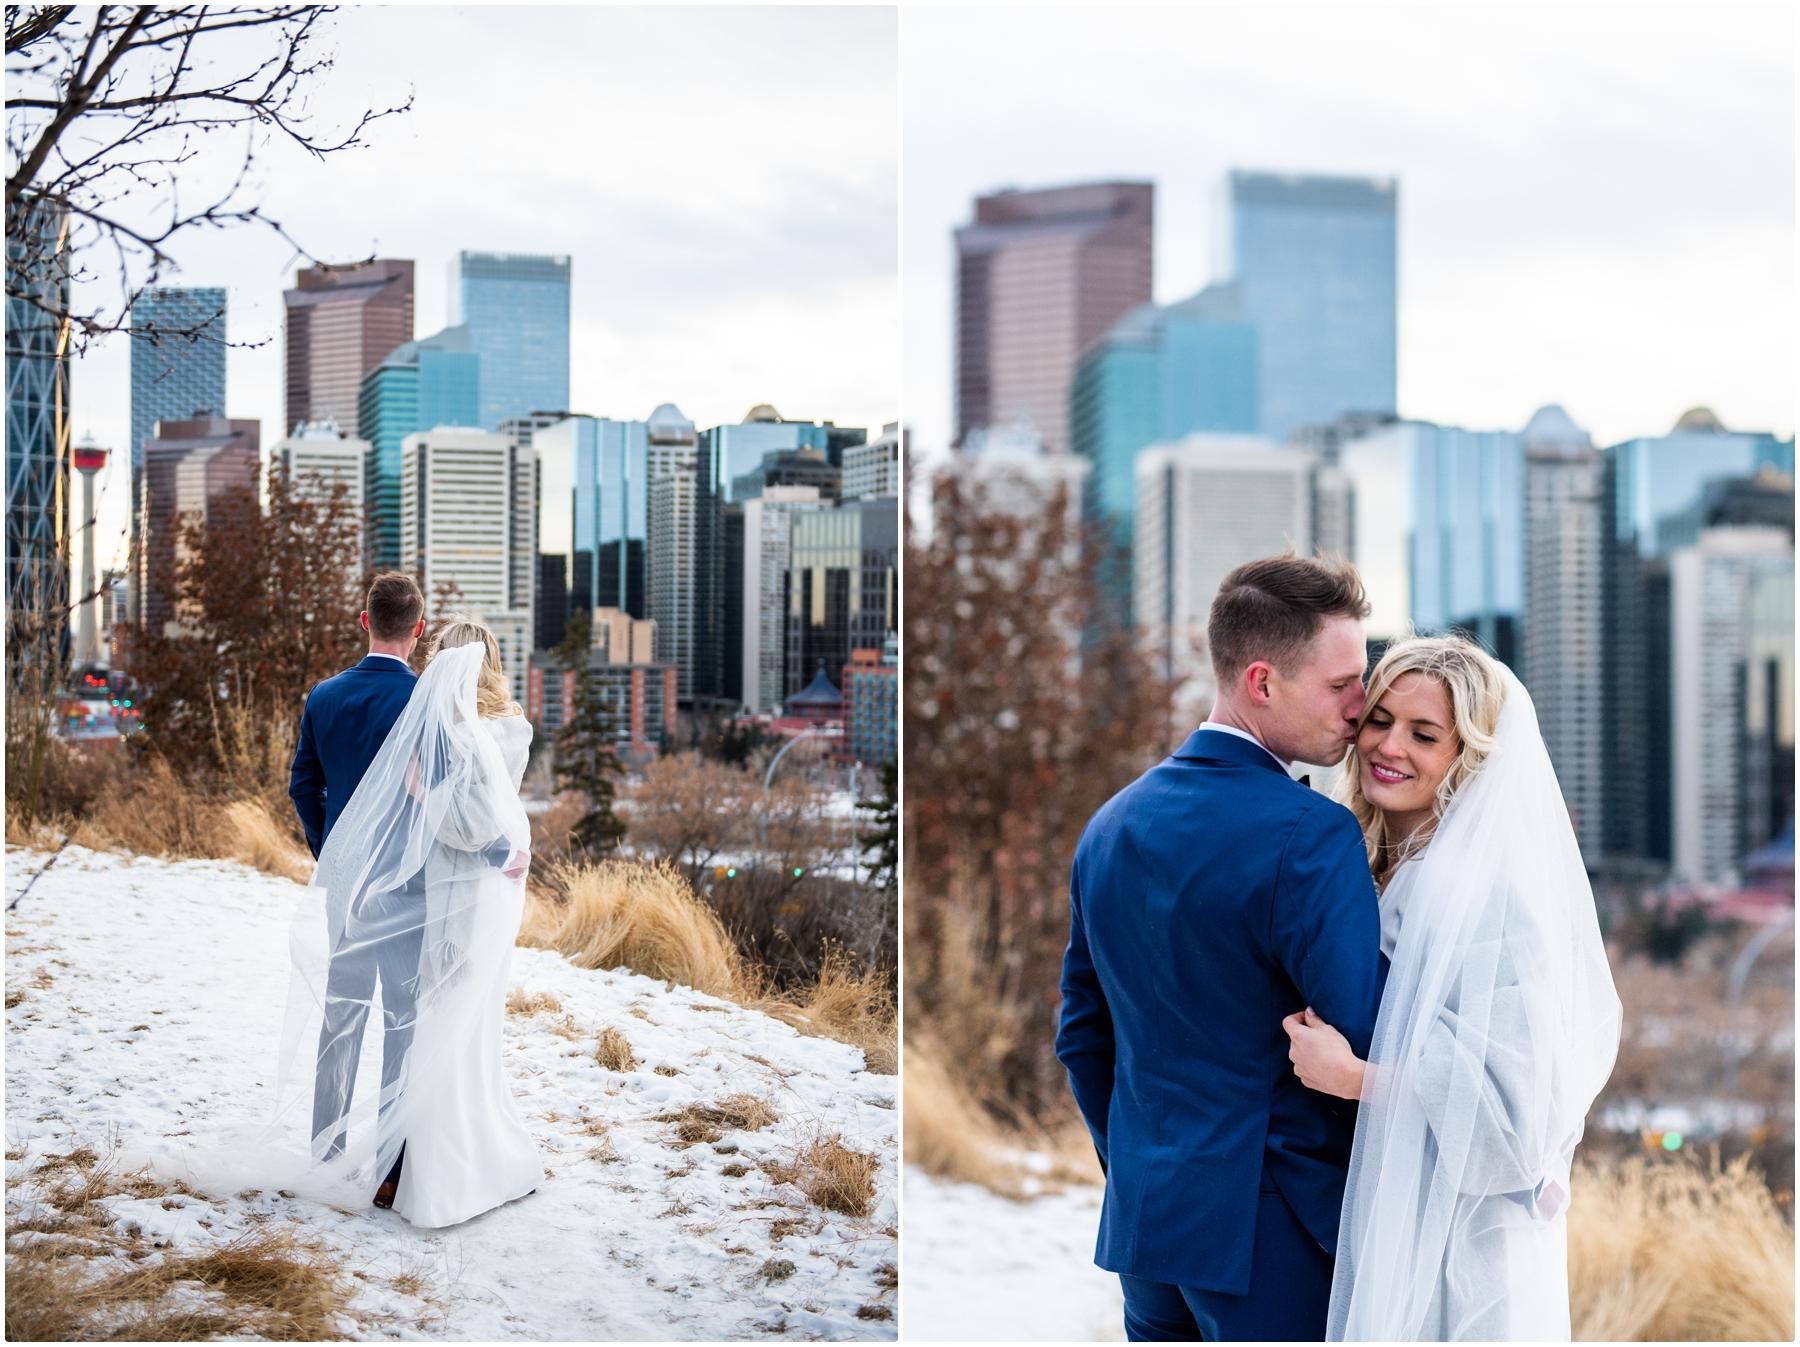 Calgary Alberta Winter Urban Wedding Photographer